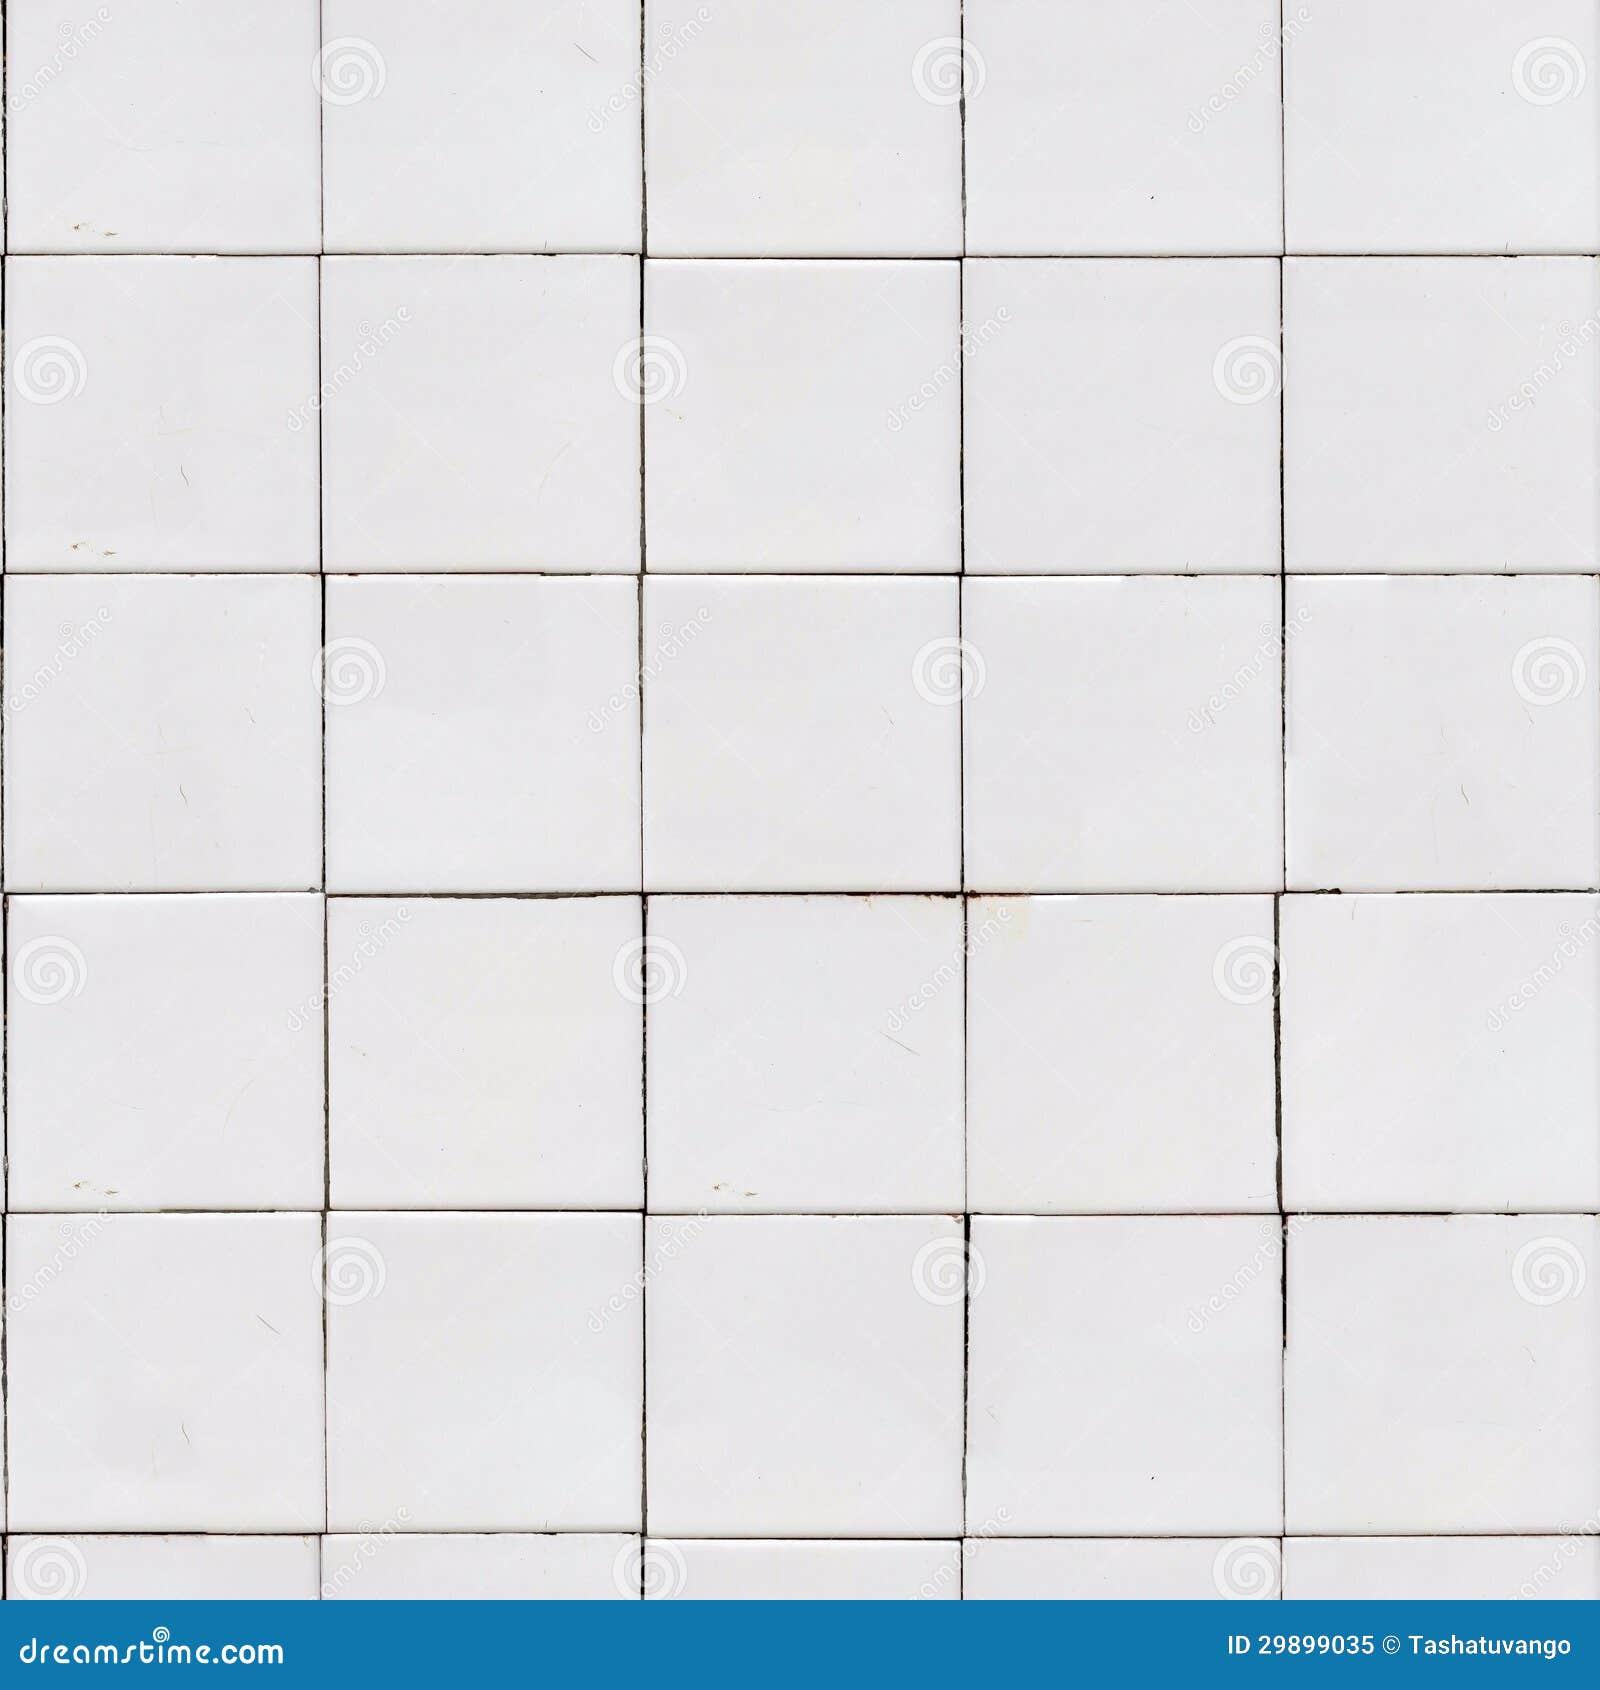 wei e fliesen wand beschaffenheit stock abbildung illustration von leerzeichen zustand 29899035. Black Bedroom Furniture Sets. Home Design Ideas